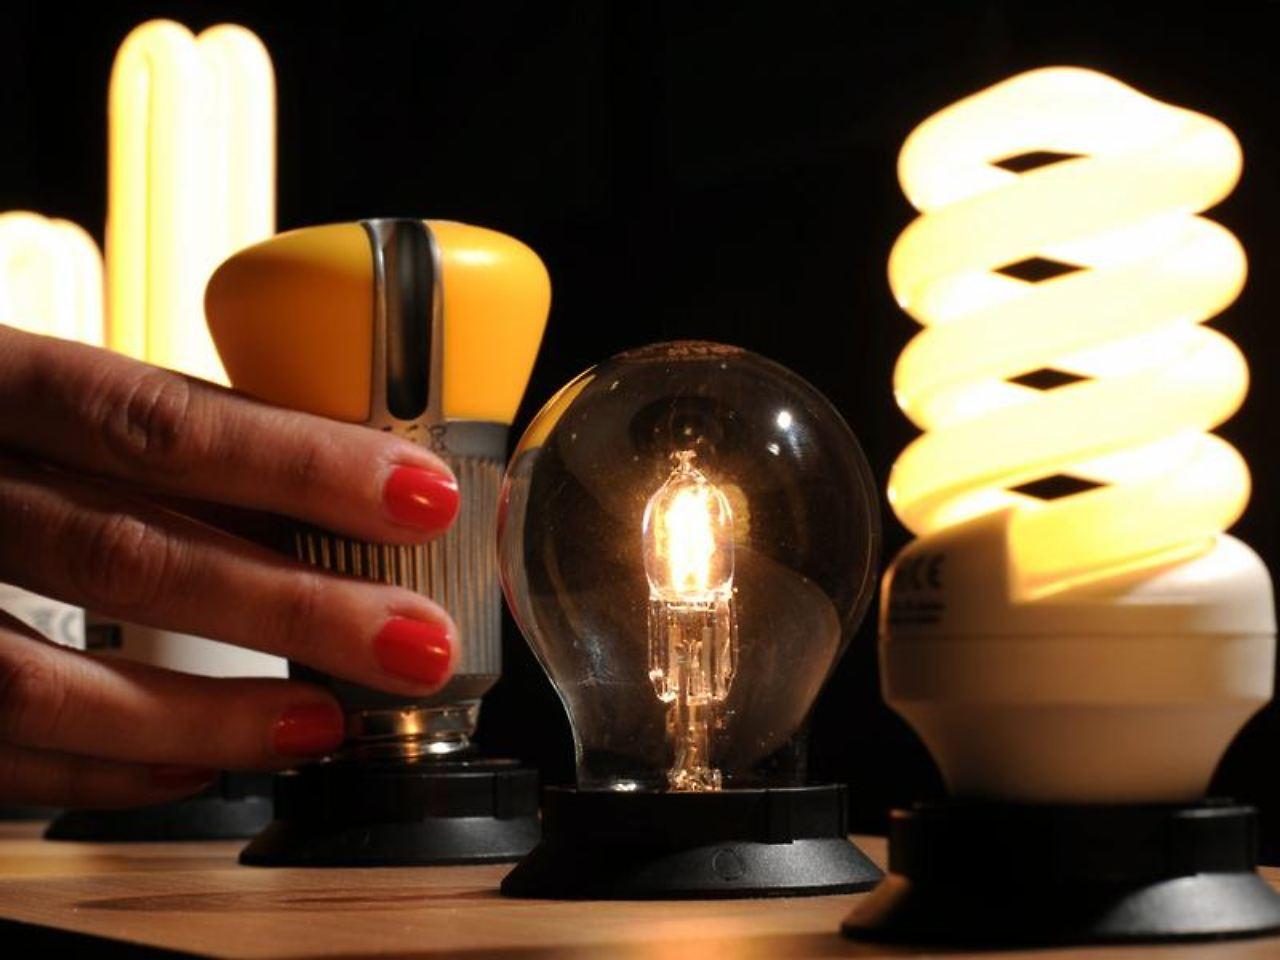 warentest pr ft energiesparlampen richtig gut ist teuer n. Black Bedroom Furniture Sets. Home Design Ideas